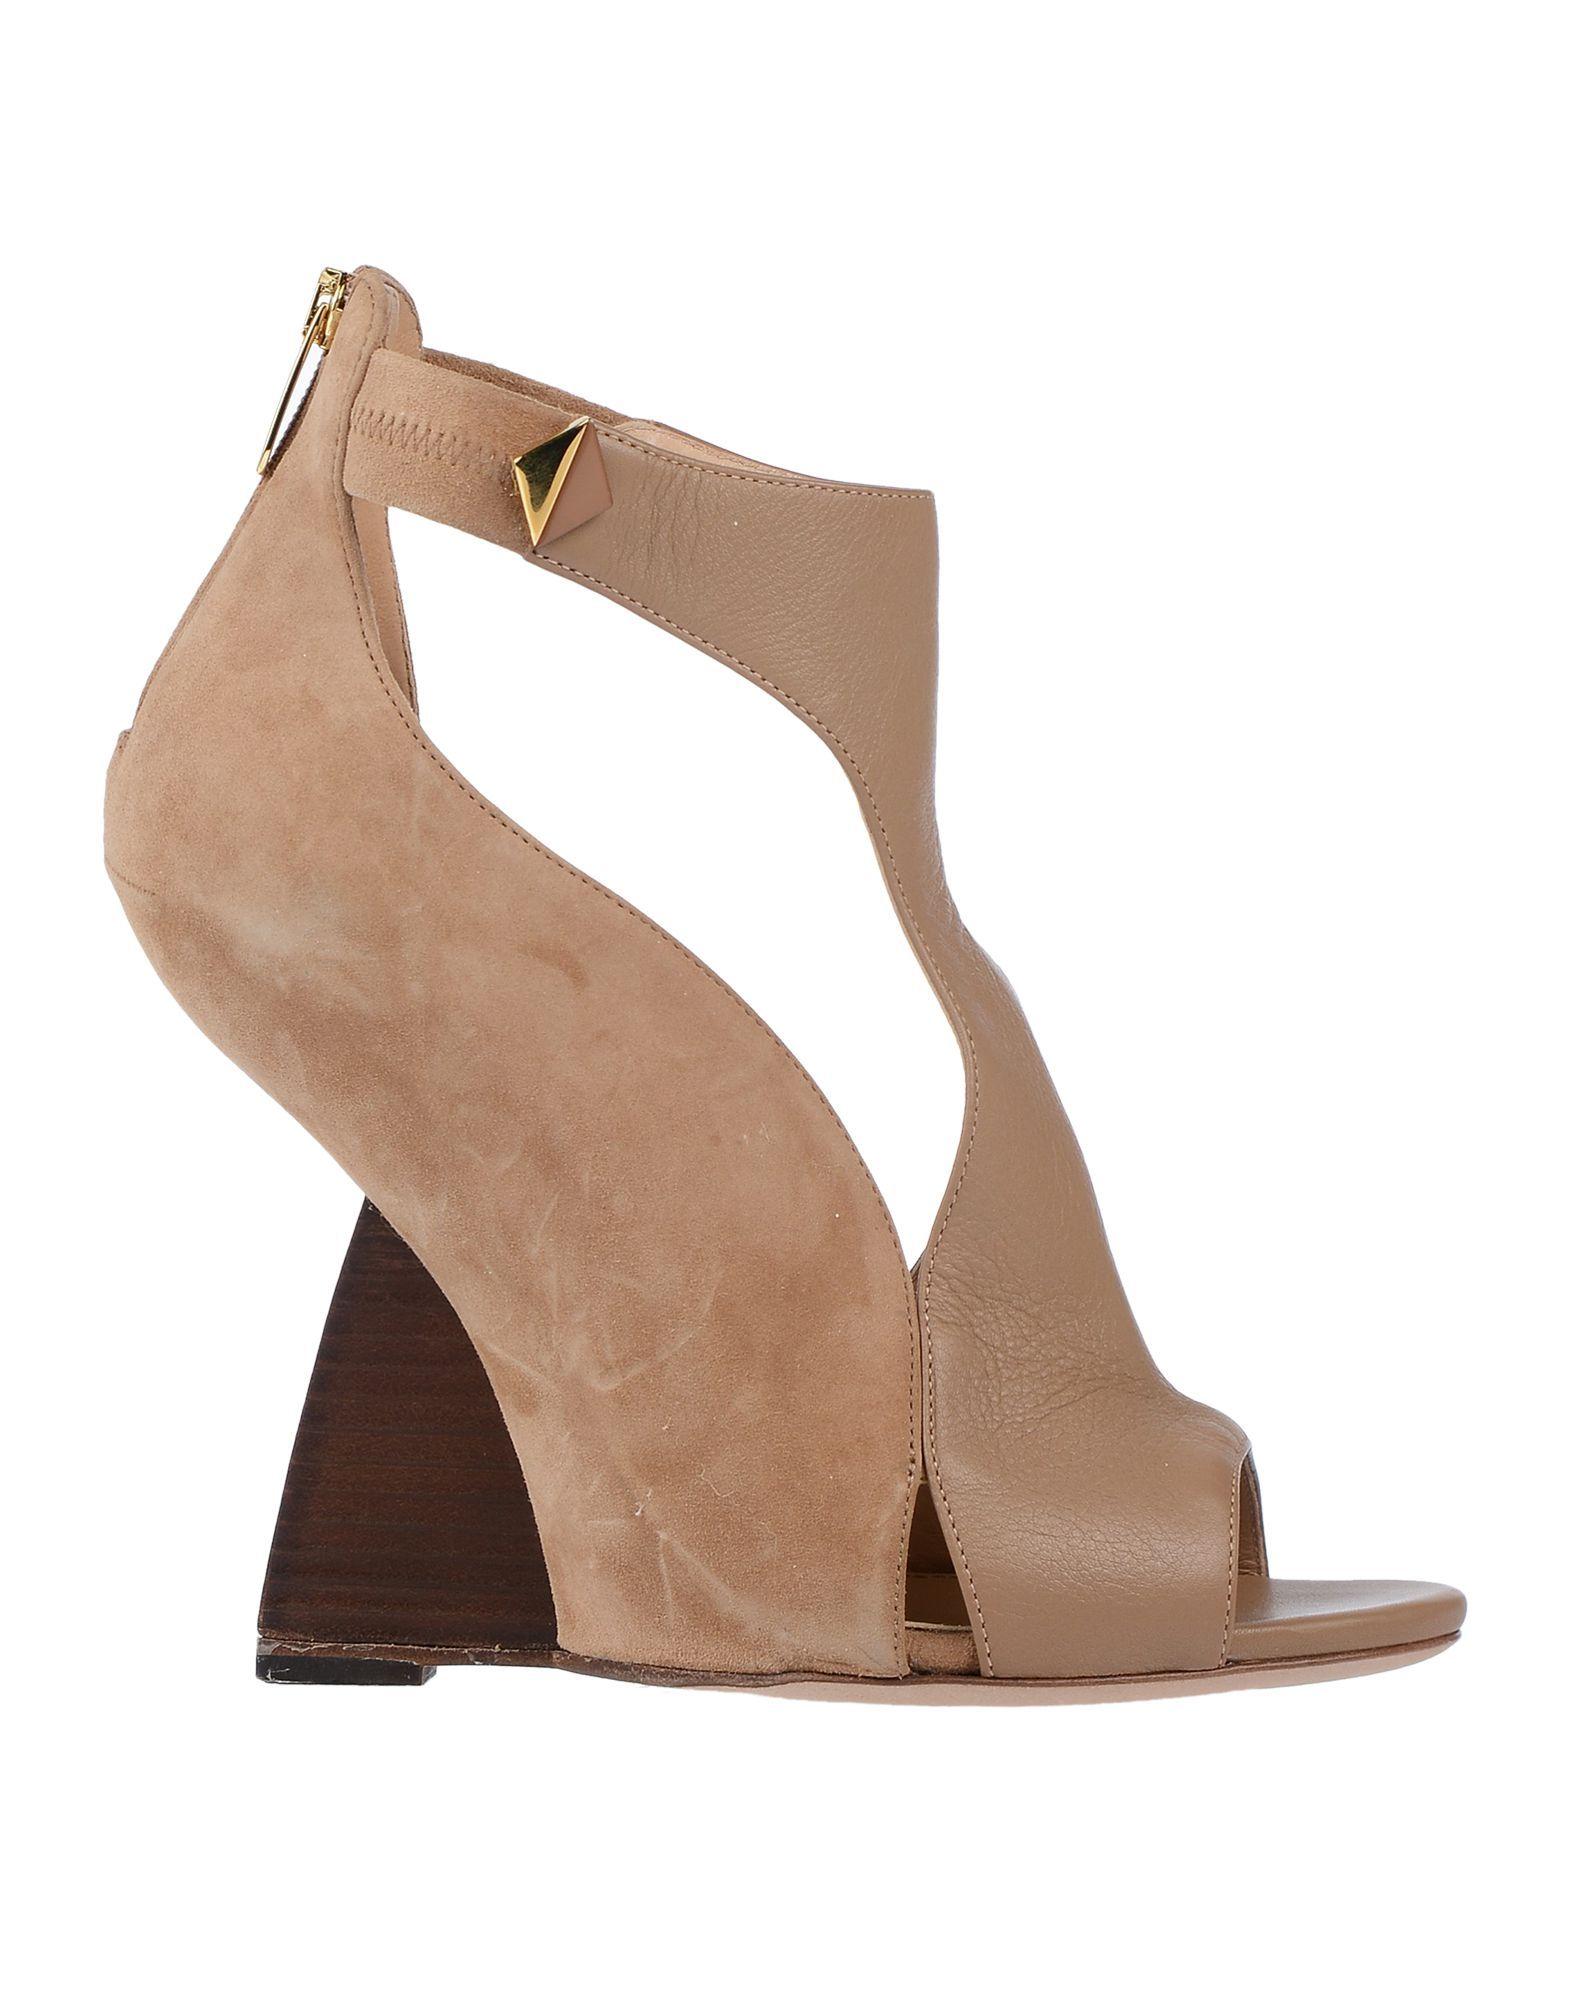 Sergio Rossi Camel Leather Heels